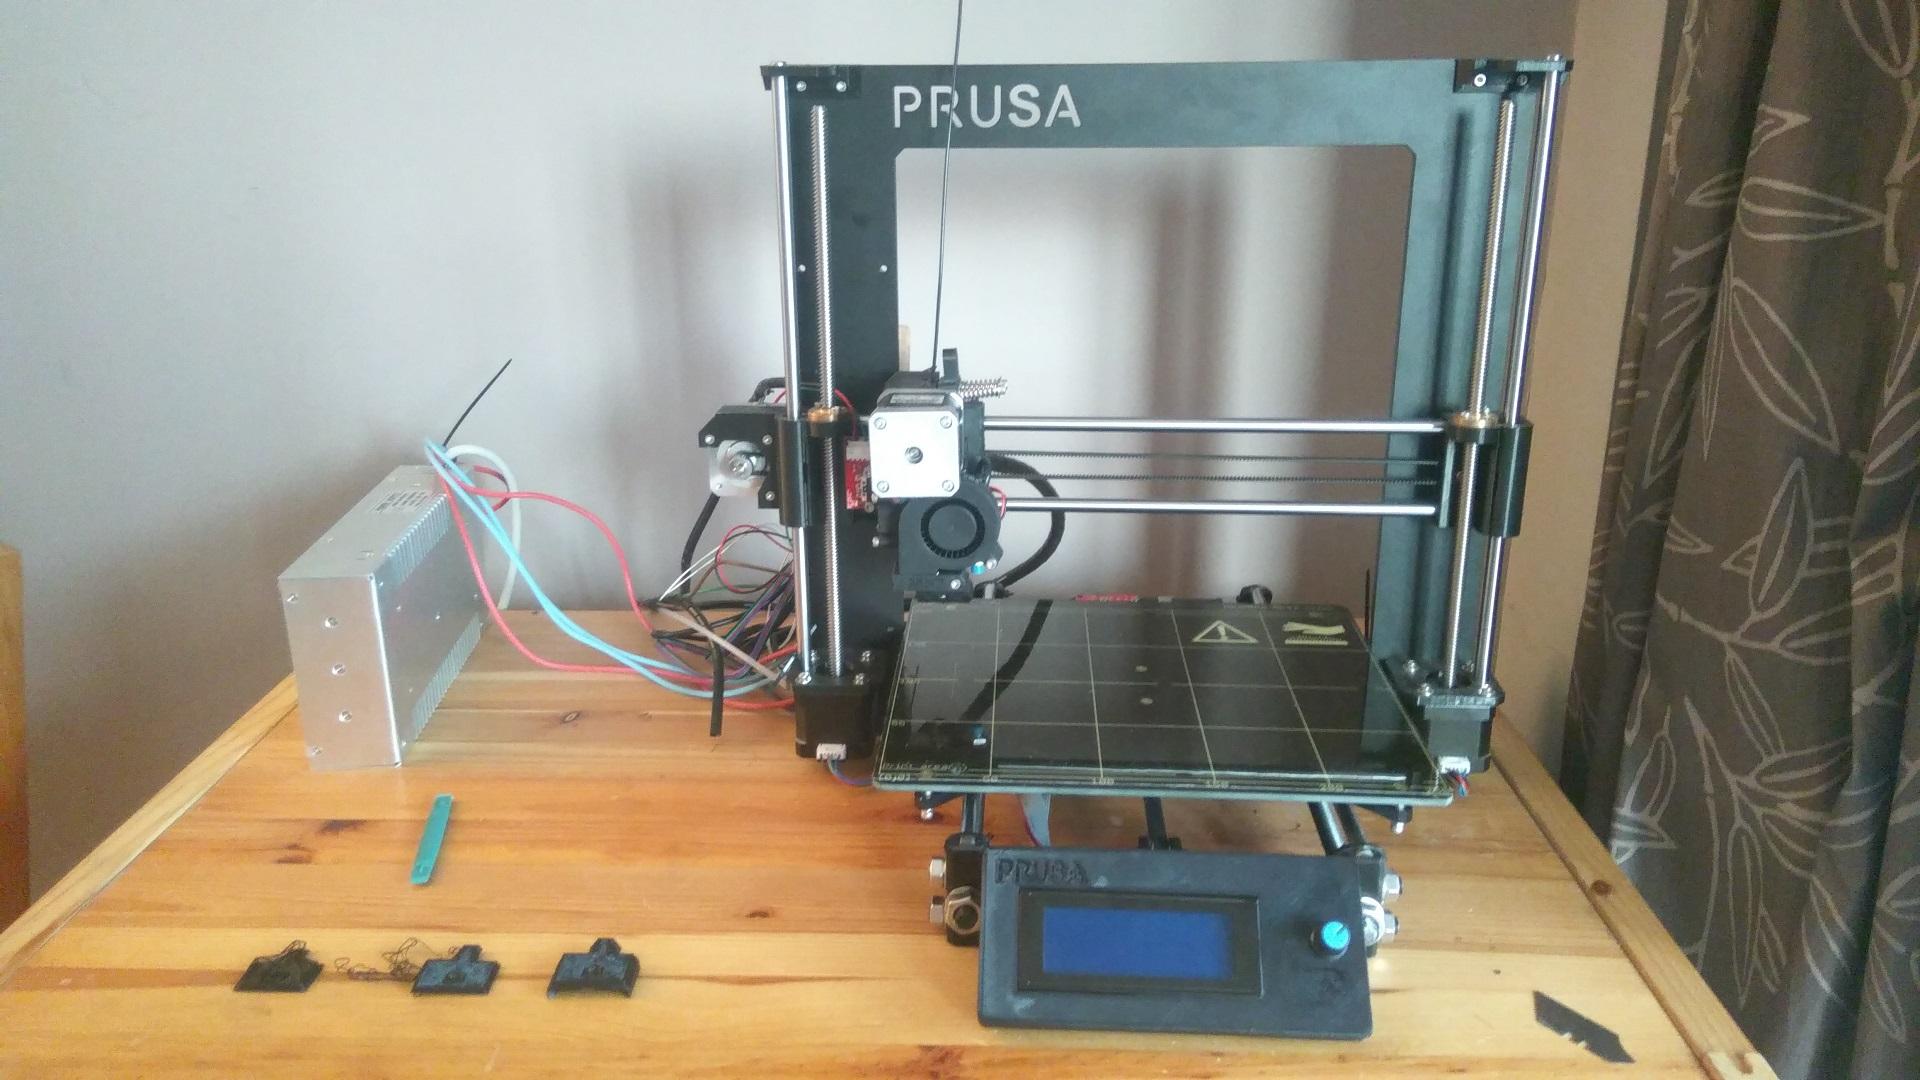 Dolly Build Notes (Prusa i3 Mk2 clone 3D printer) - AndyPi